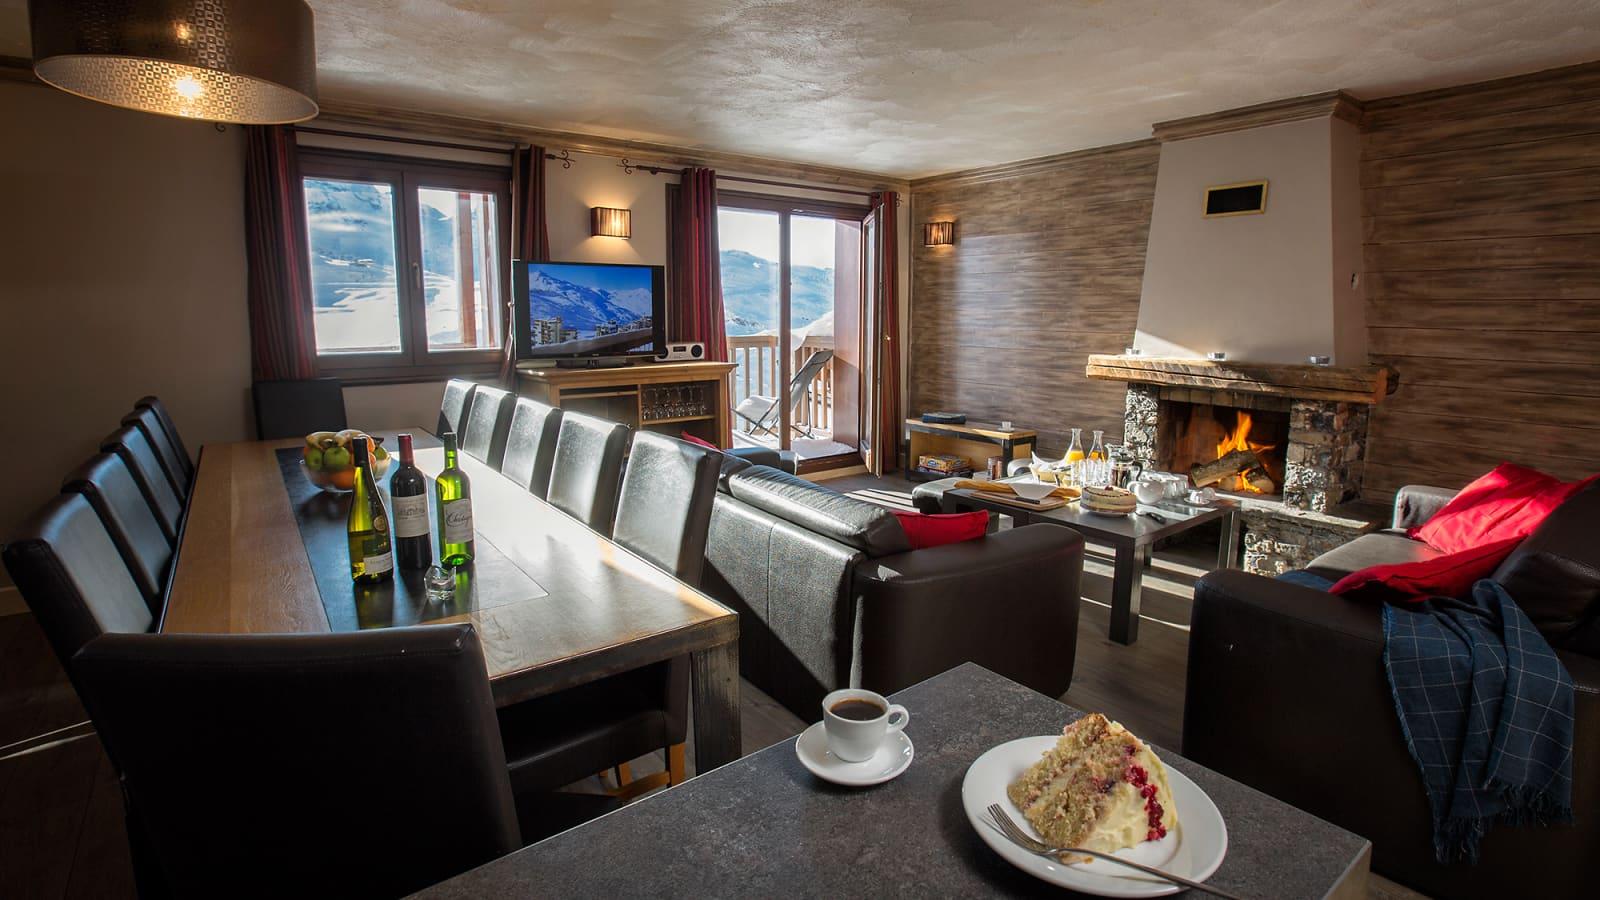 Chalet Renne Val Thorens France Ski Holidays From Topflight Ie